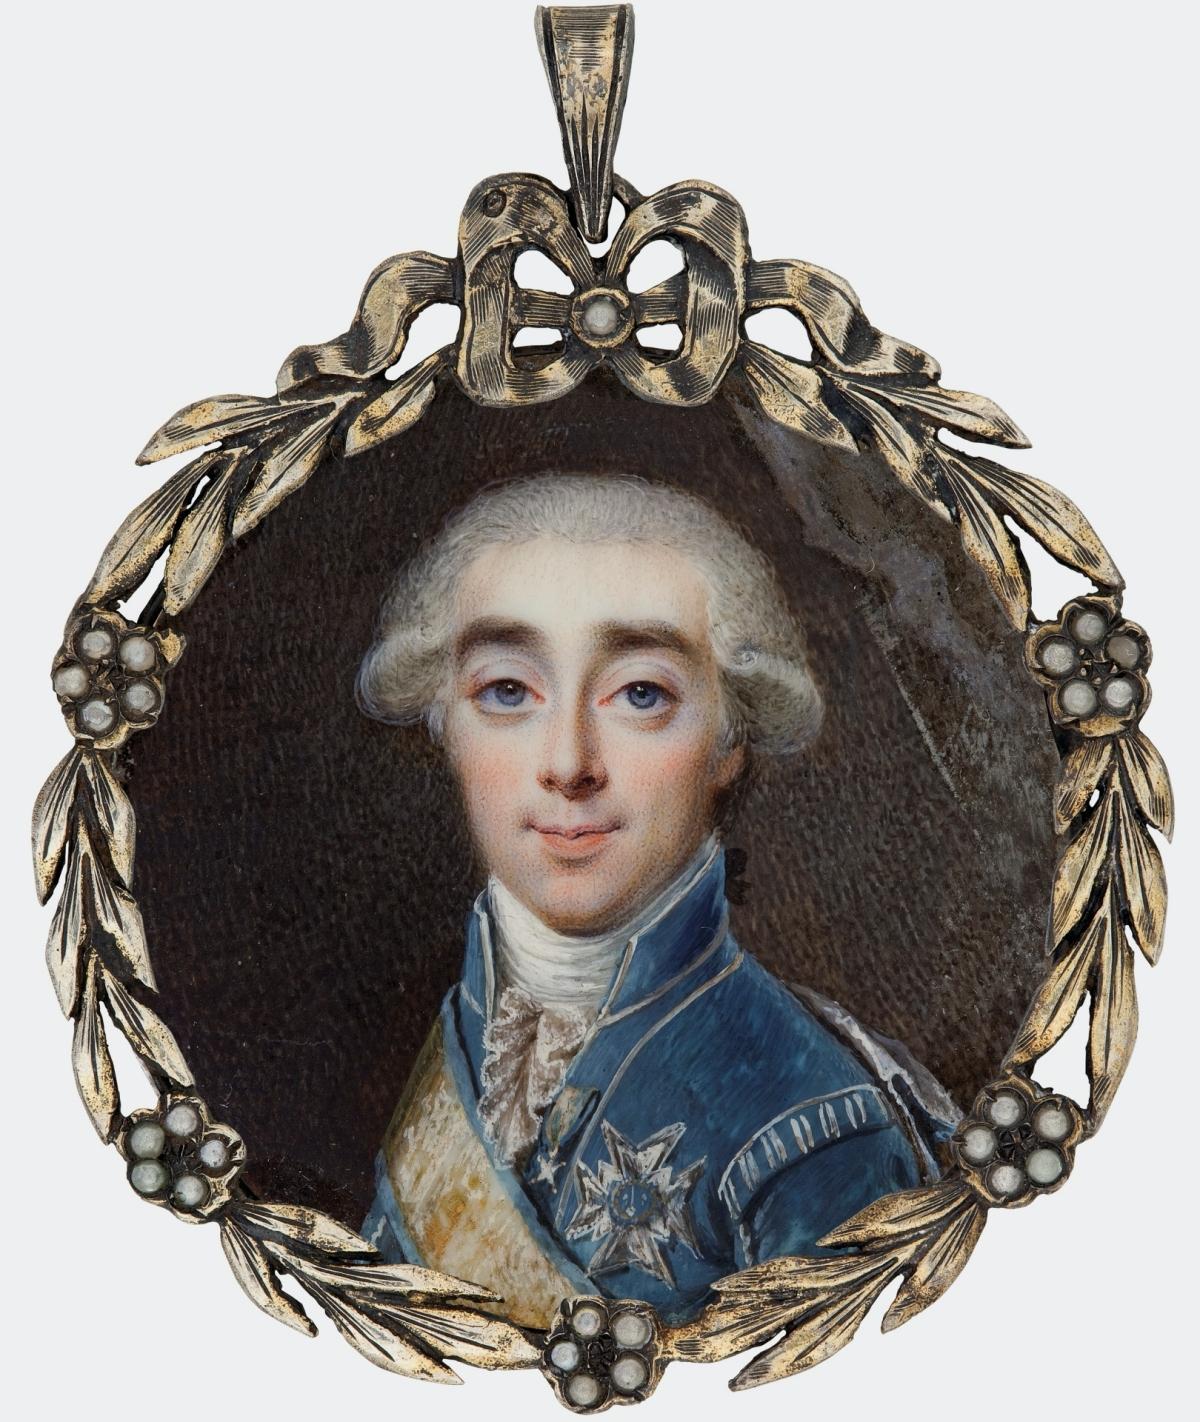 gauche on ivory miniature of Count Axel von Fersen from 1798